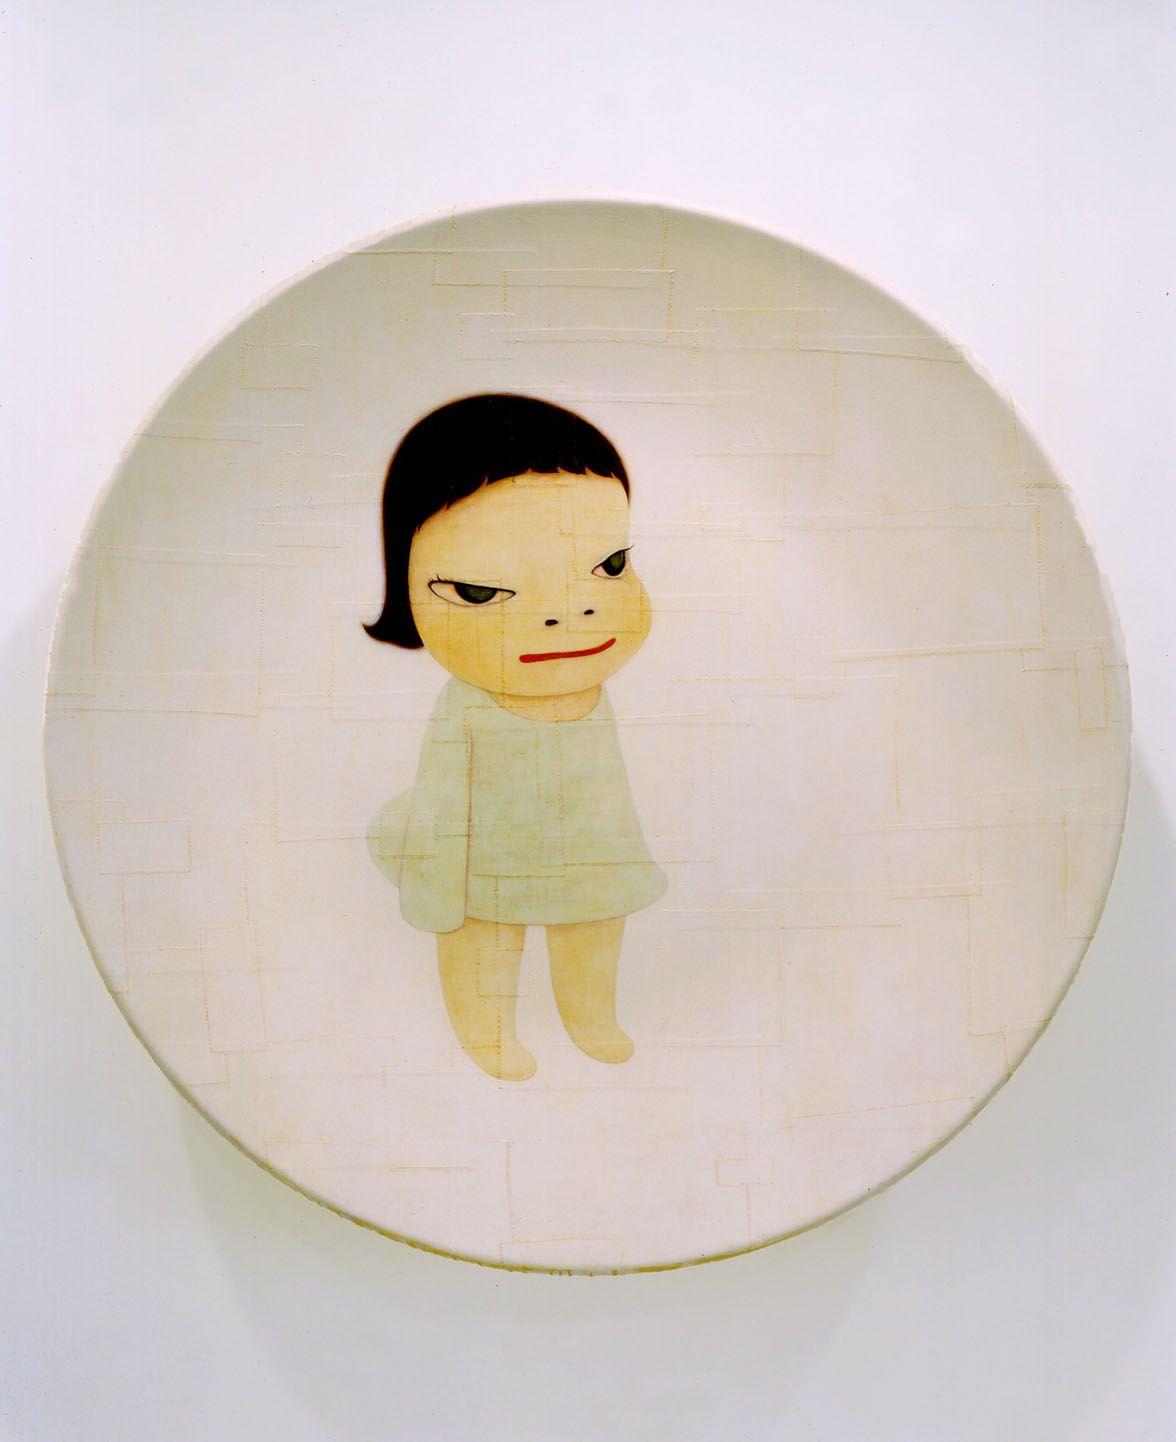 MIA, 2002 Acrylic on canvas over fiberglass, 70 3/4 inches (179.7 cm) diameter